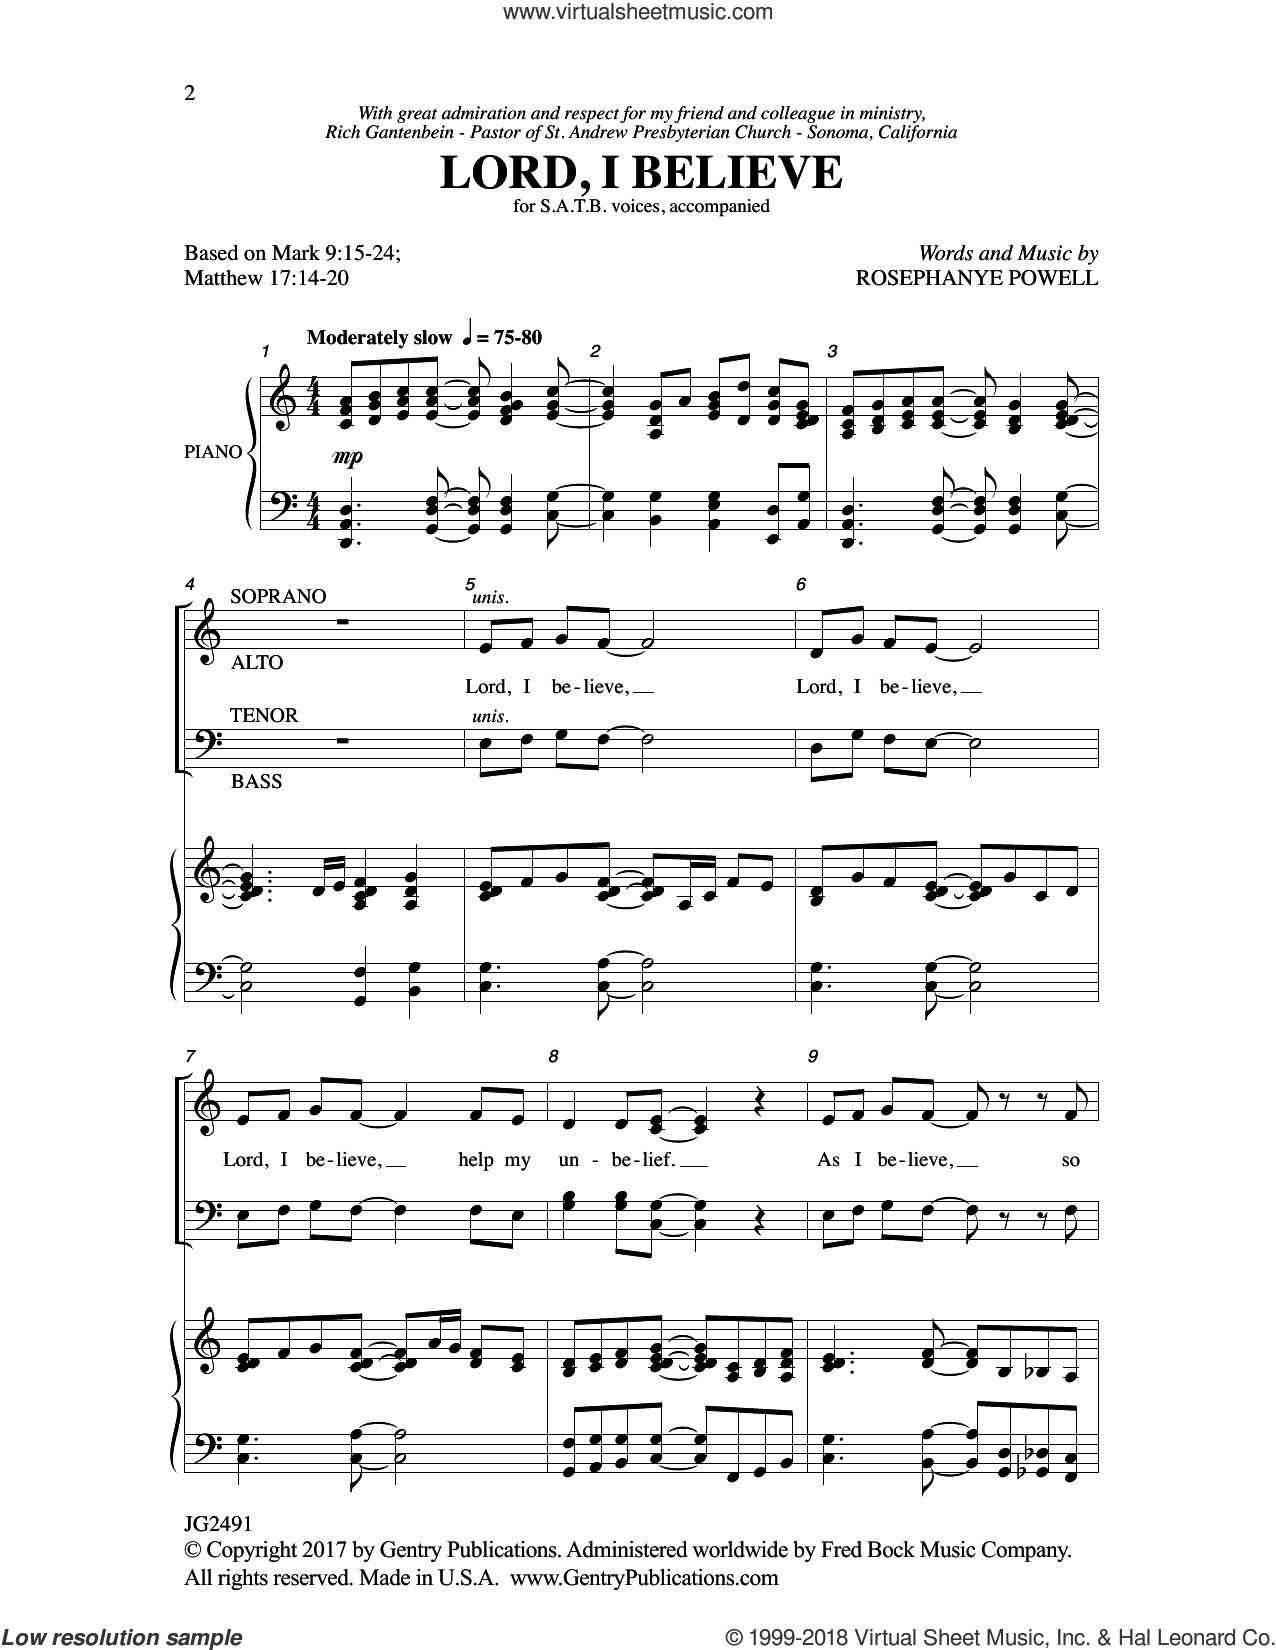 Lord, I Believe sheet music for choir (SATB: soprano, alto, tenor, bass) by Rosephanye Powell, intermediate skill level